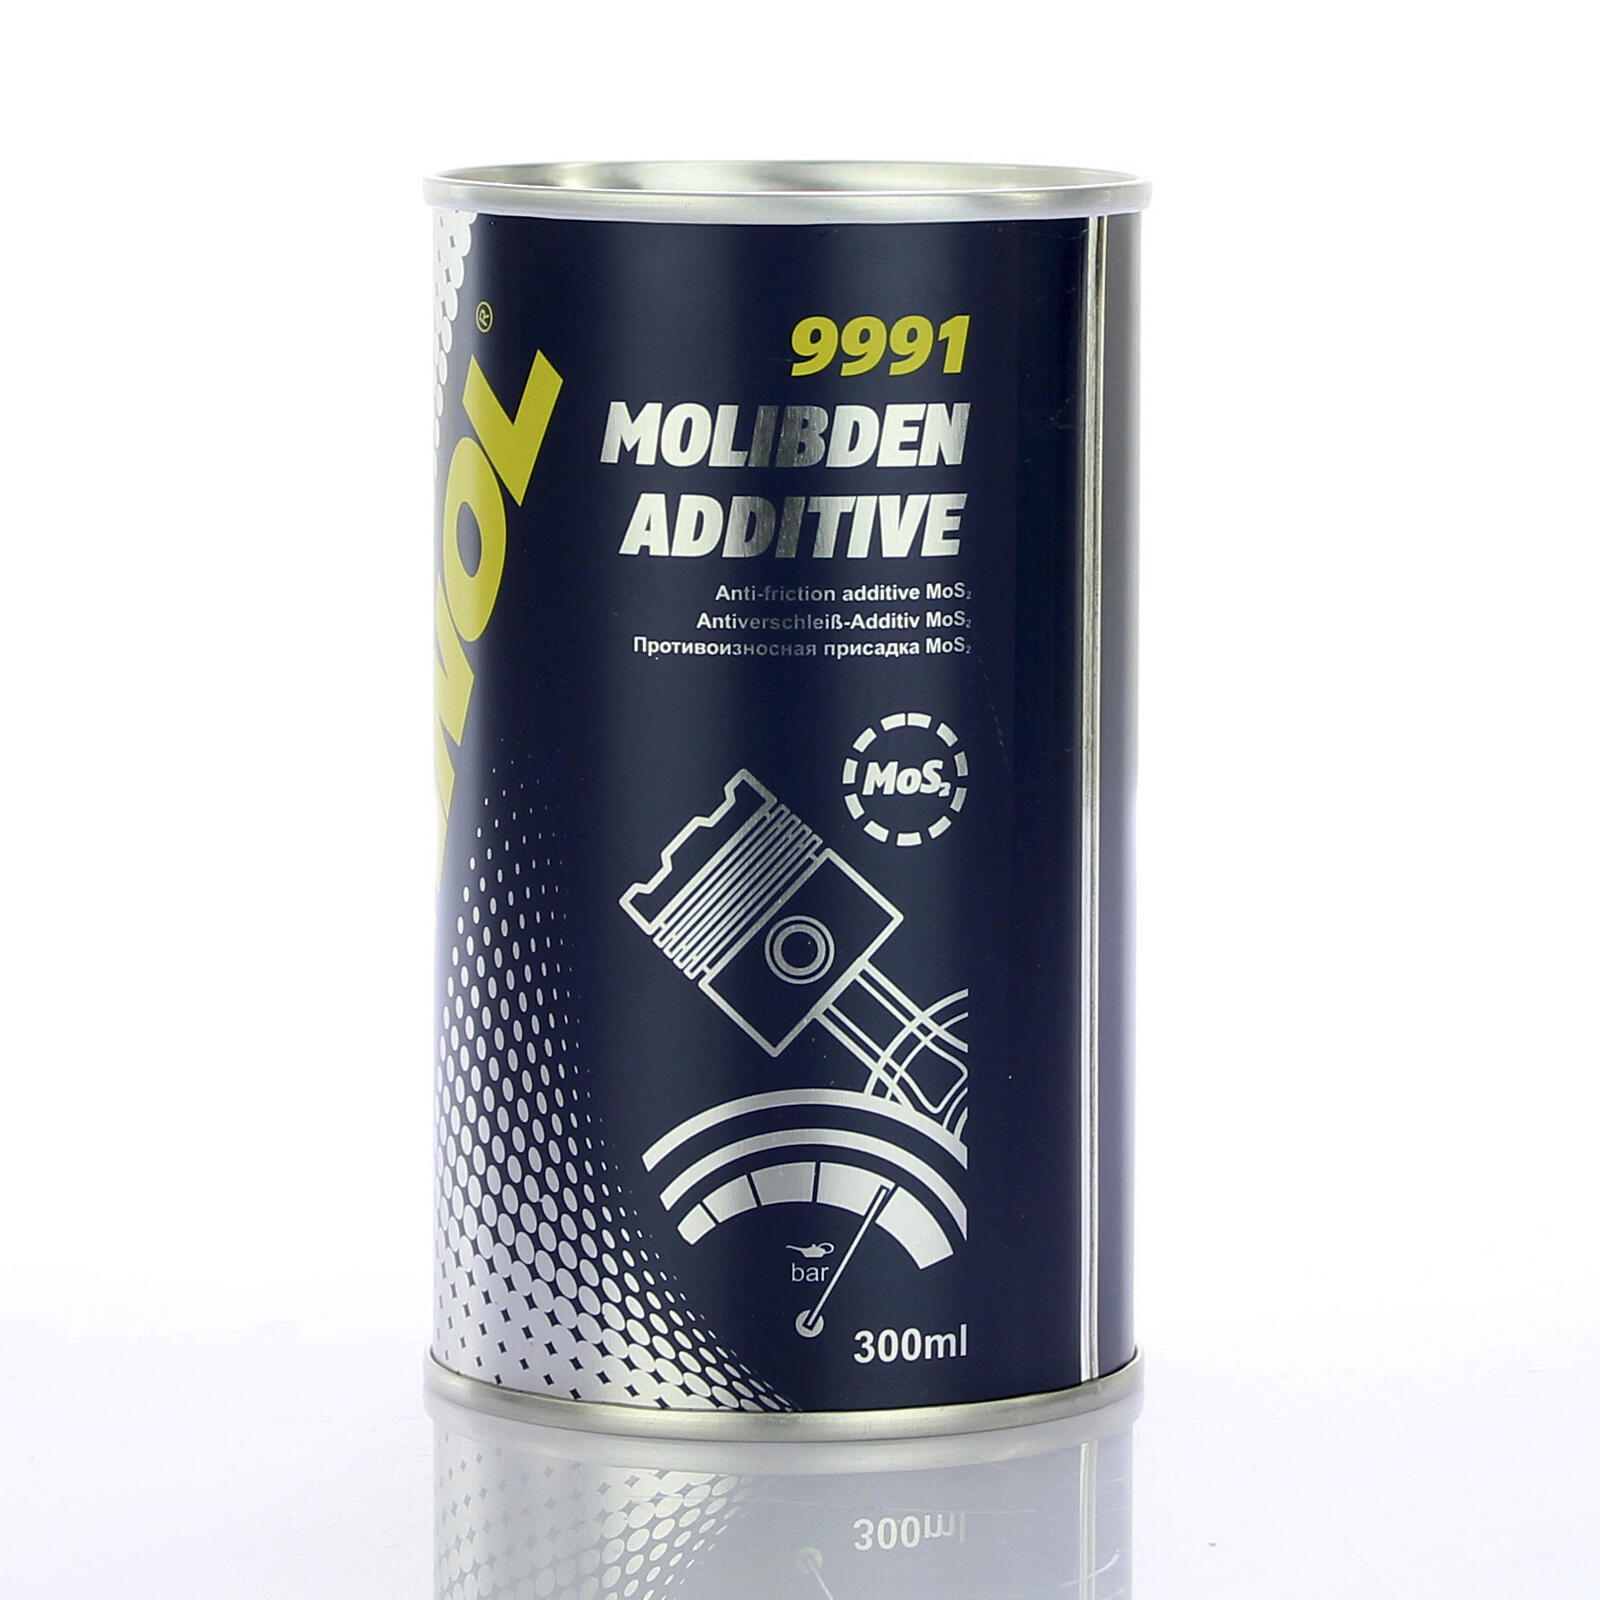 Mannol Motoradditiv 300ml MOS2 Motorölzusatz mindert Verschleiß & Reibung